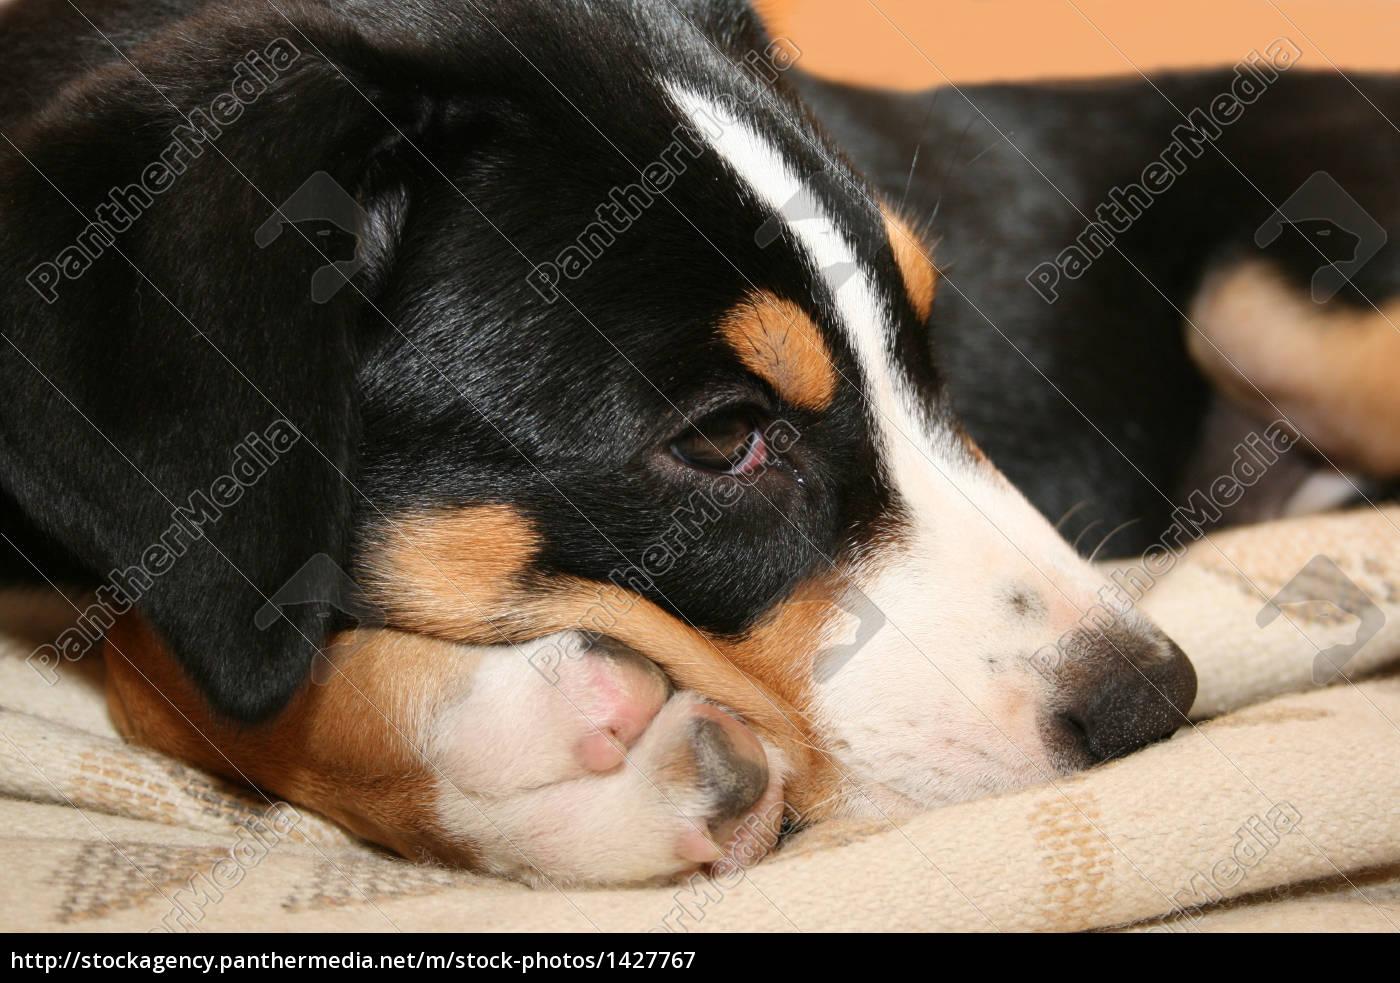 swiss, mountain, dog, puppy - 1427767